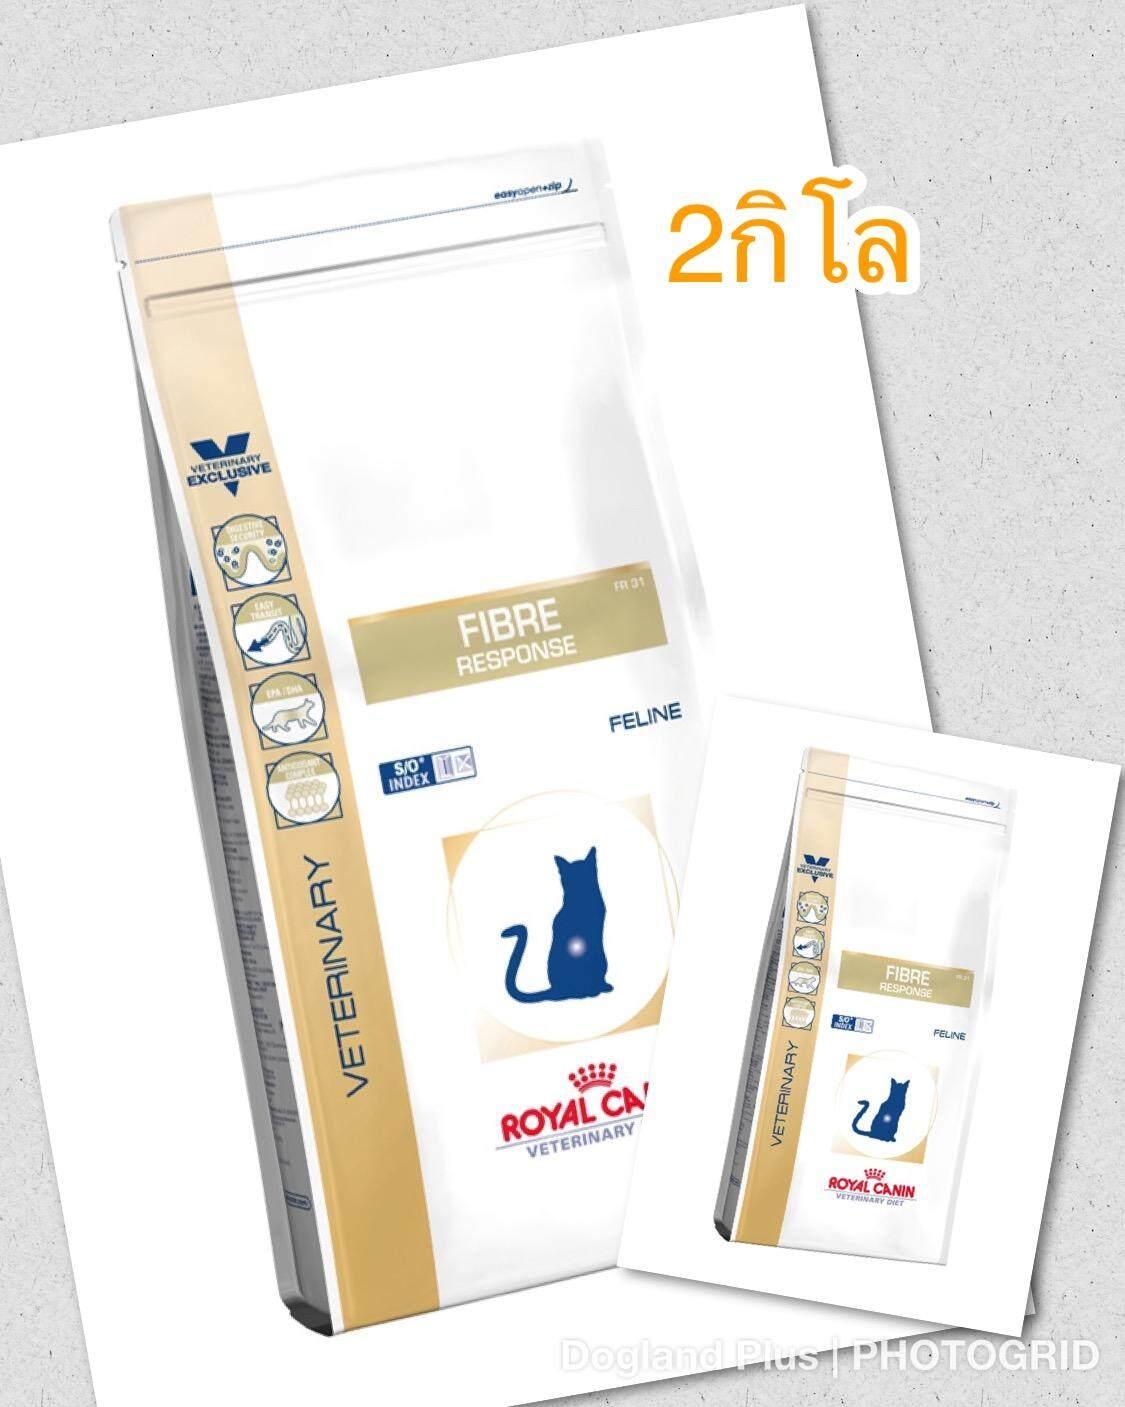 Royal Canin Fibre Response แมวท้องผูก 2 กิโล By Dogland Plus.